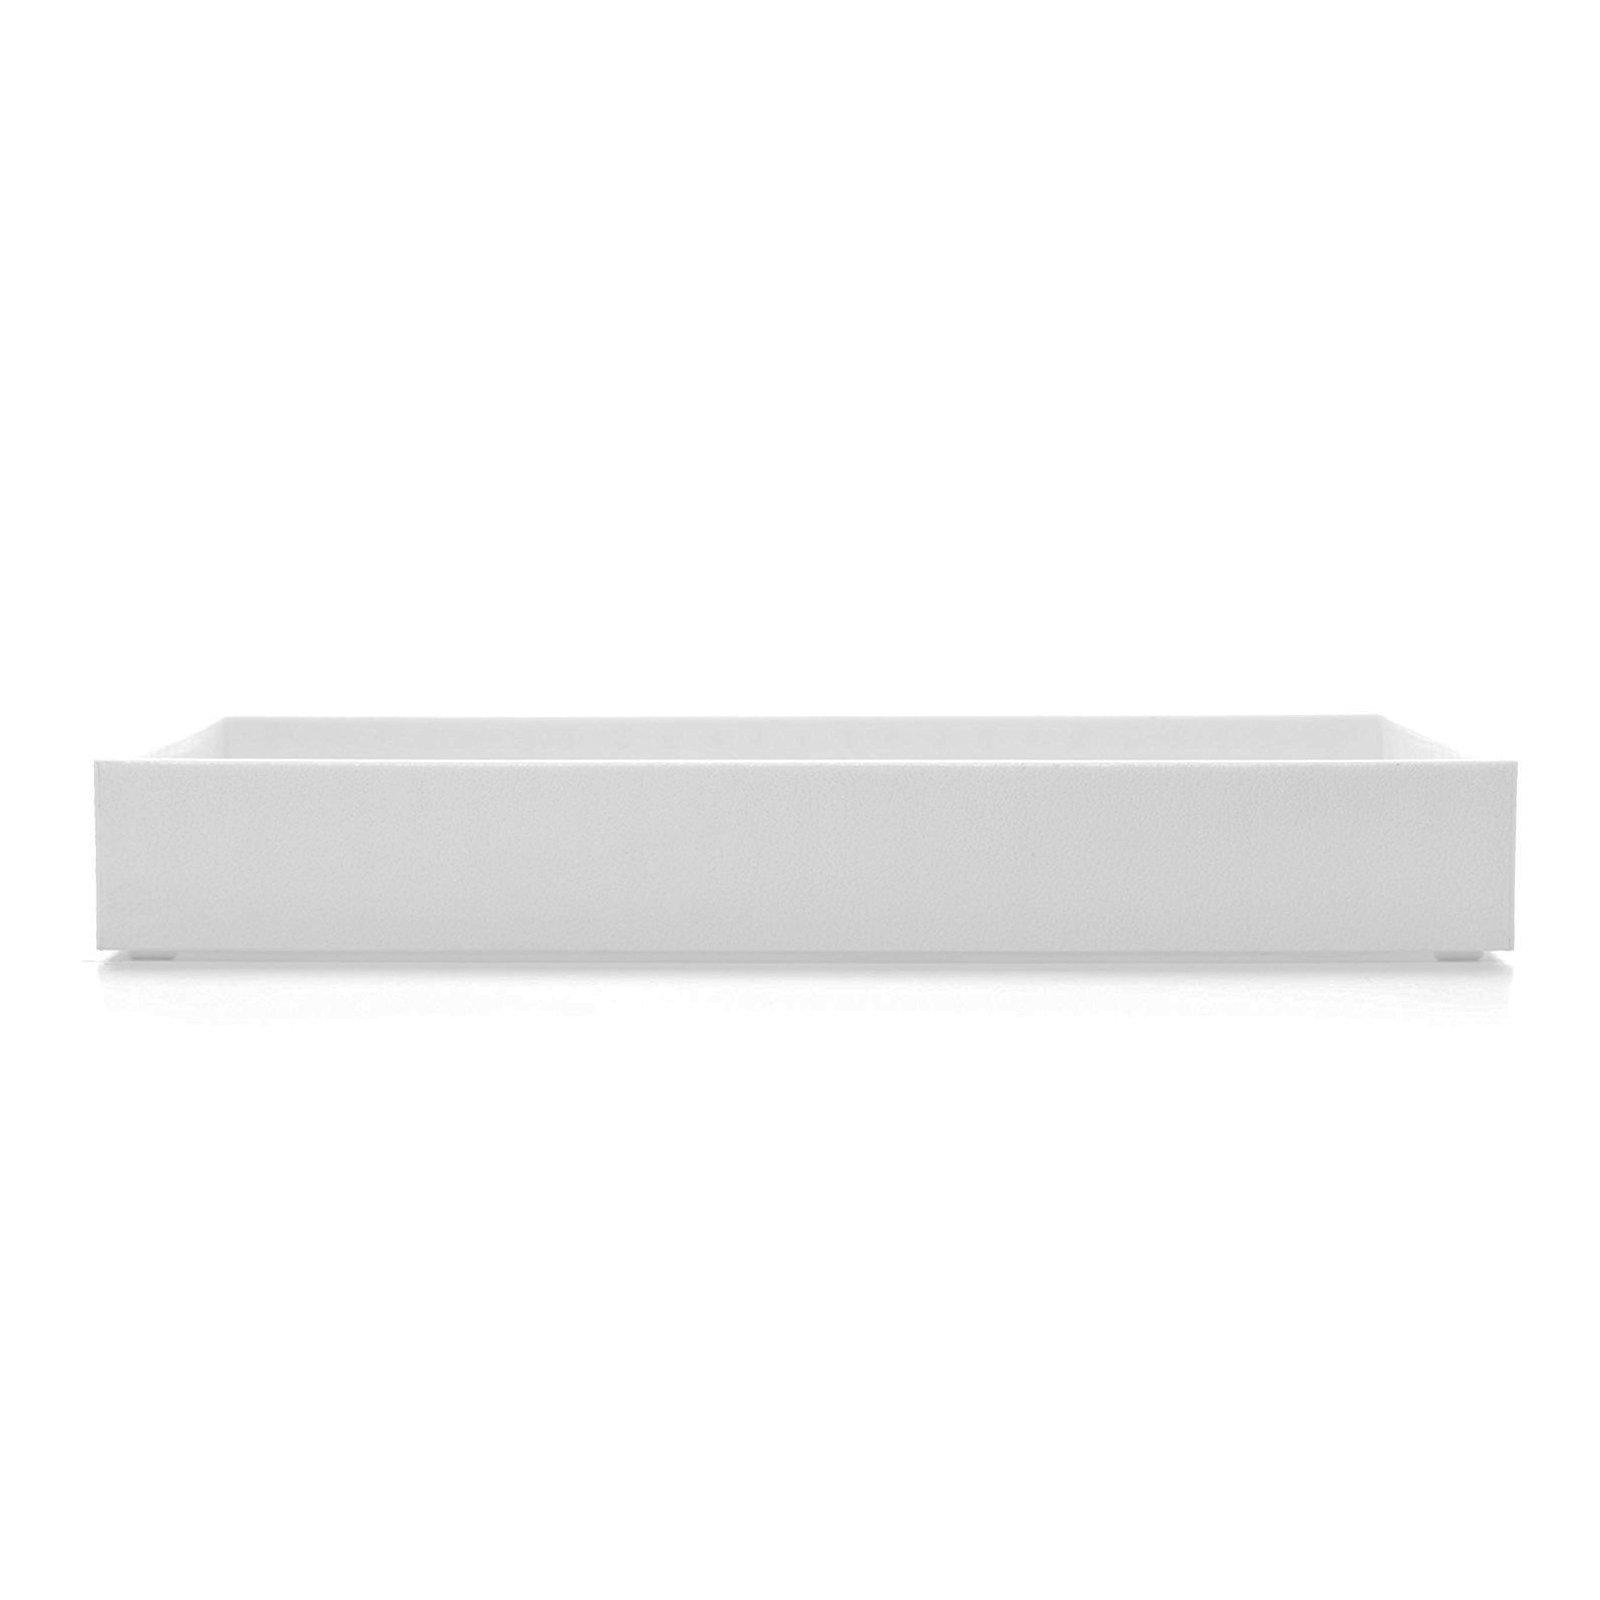 "SE JT912W 2"" Jeweler's ABS Display Tray, White"